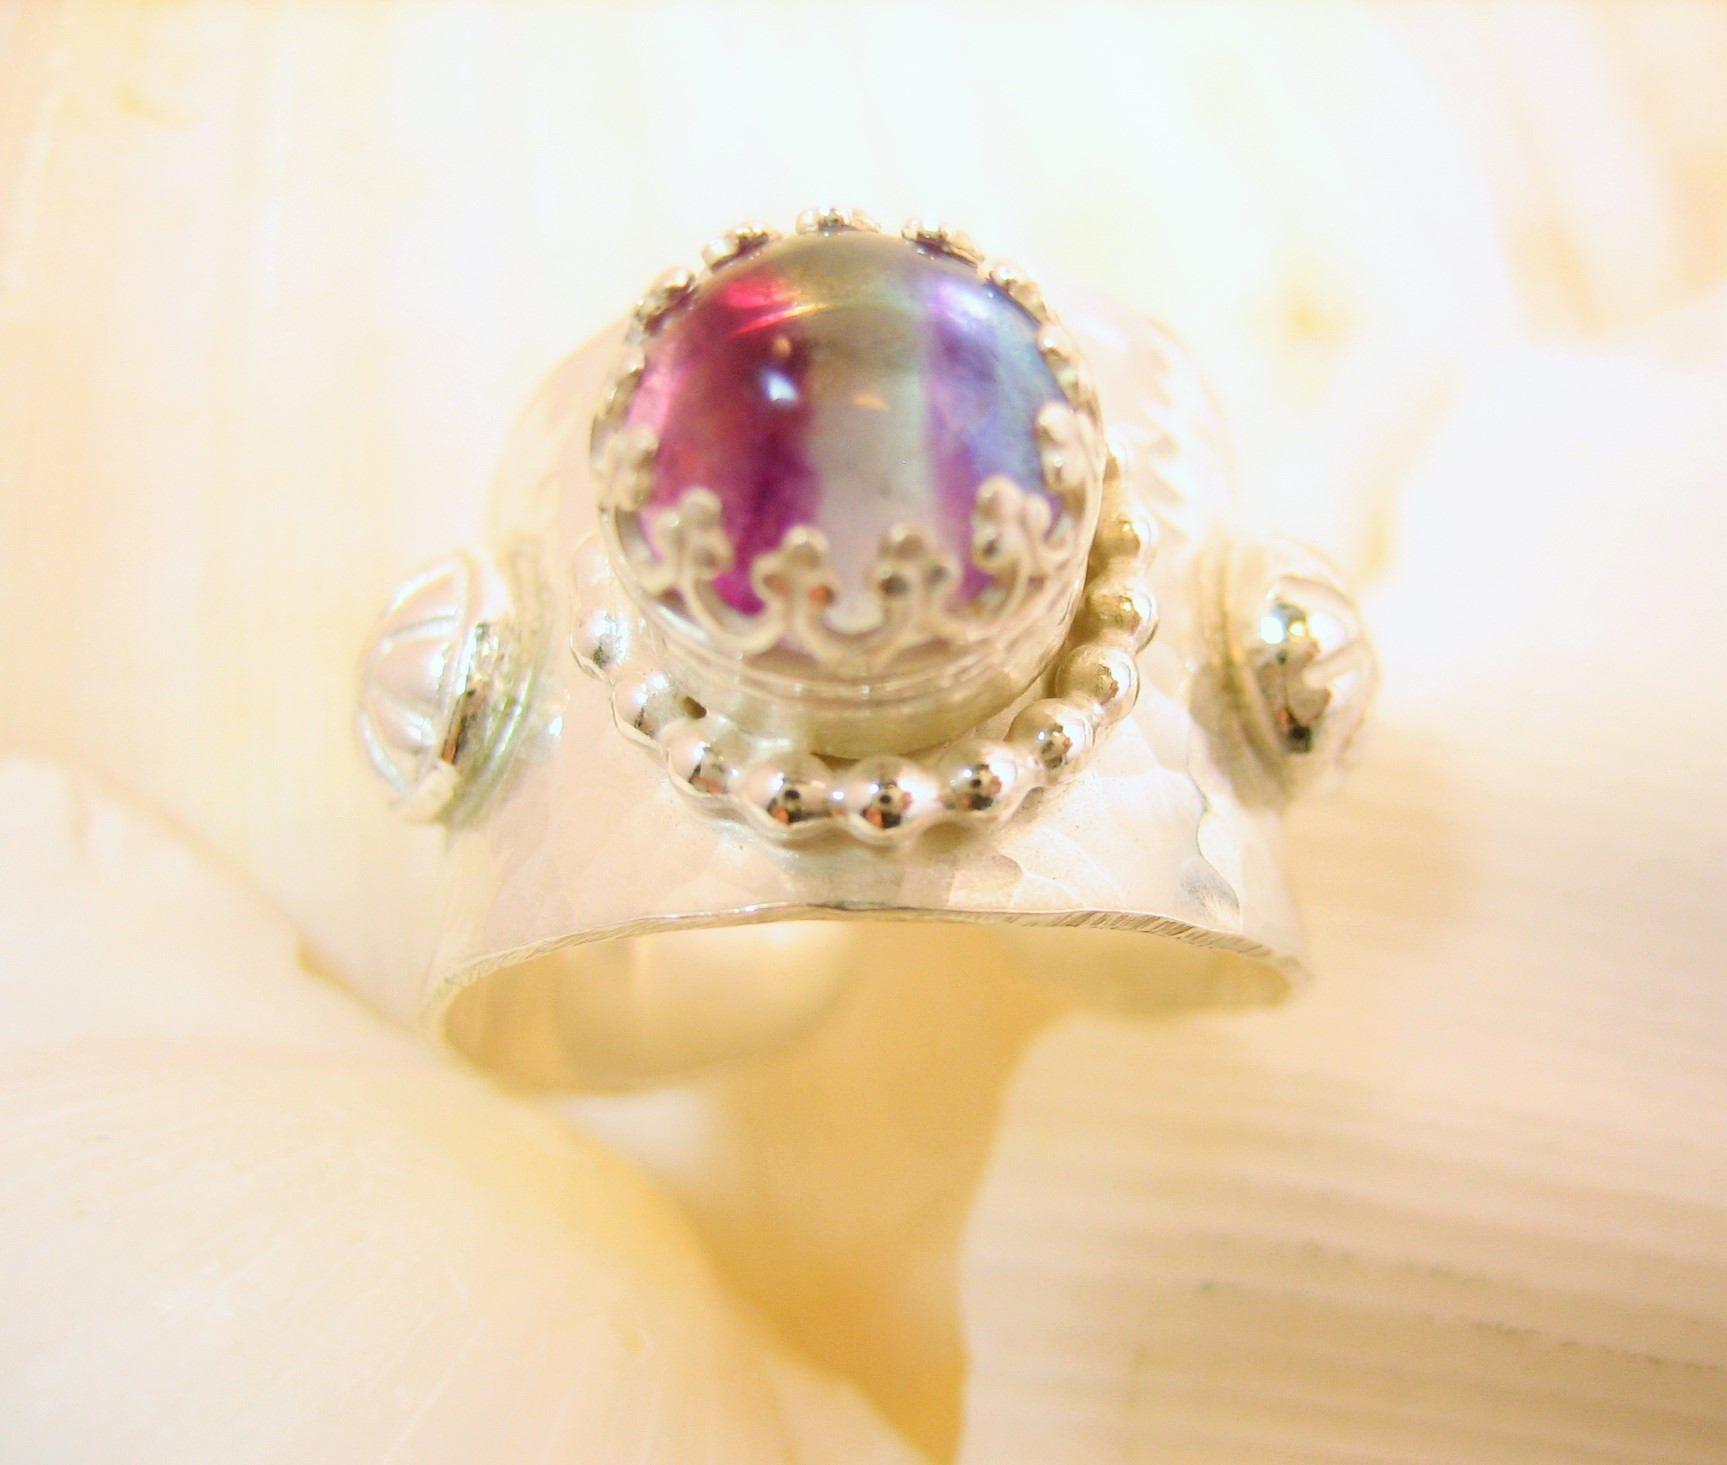 Princess rainbow adjustable ring, hammered silver adjustable ring with rainbow gem, rainbow fluorite ring, fairy rainbow ring, regal ring